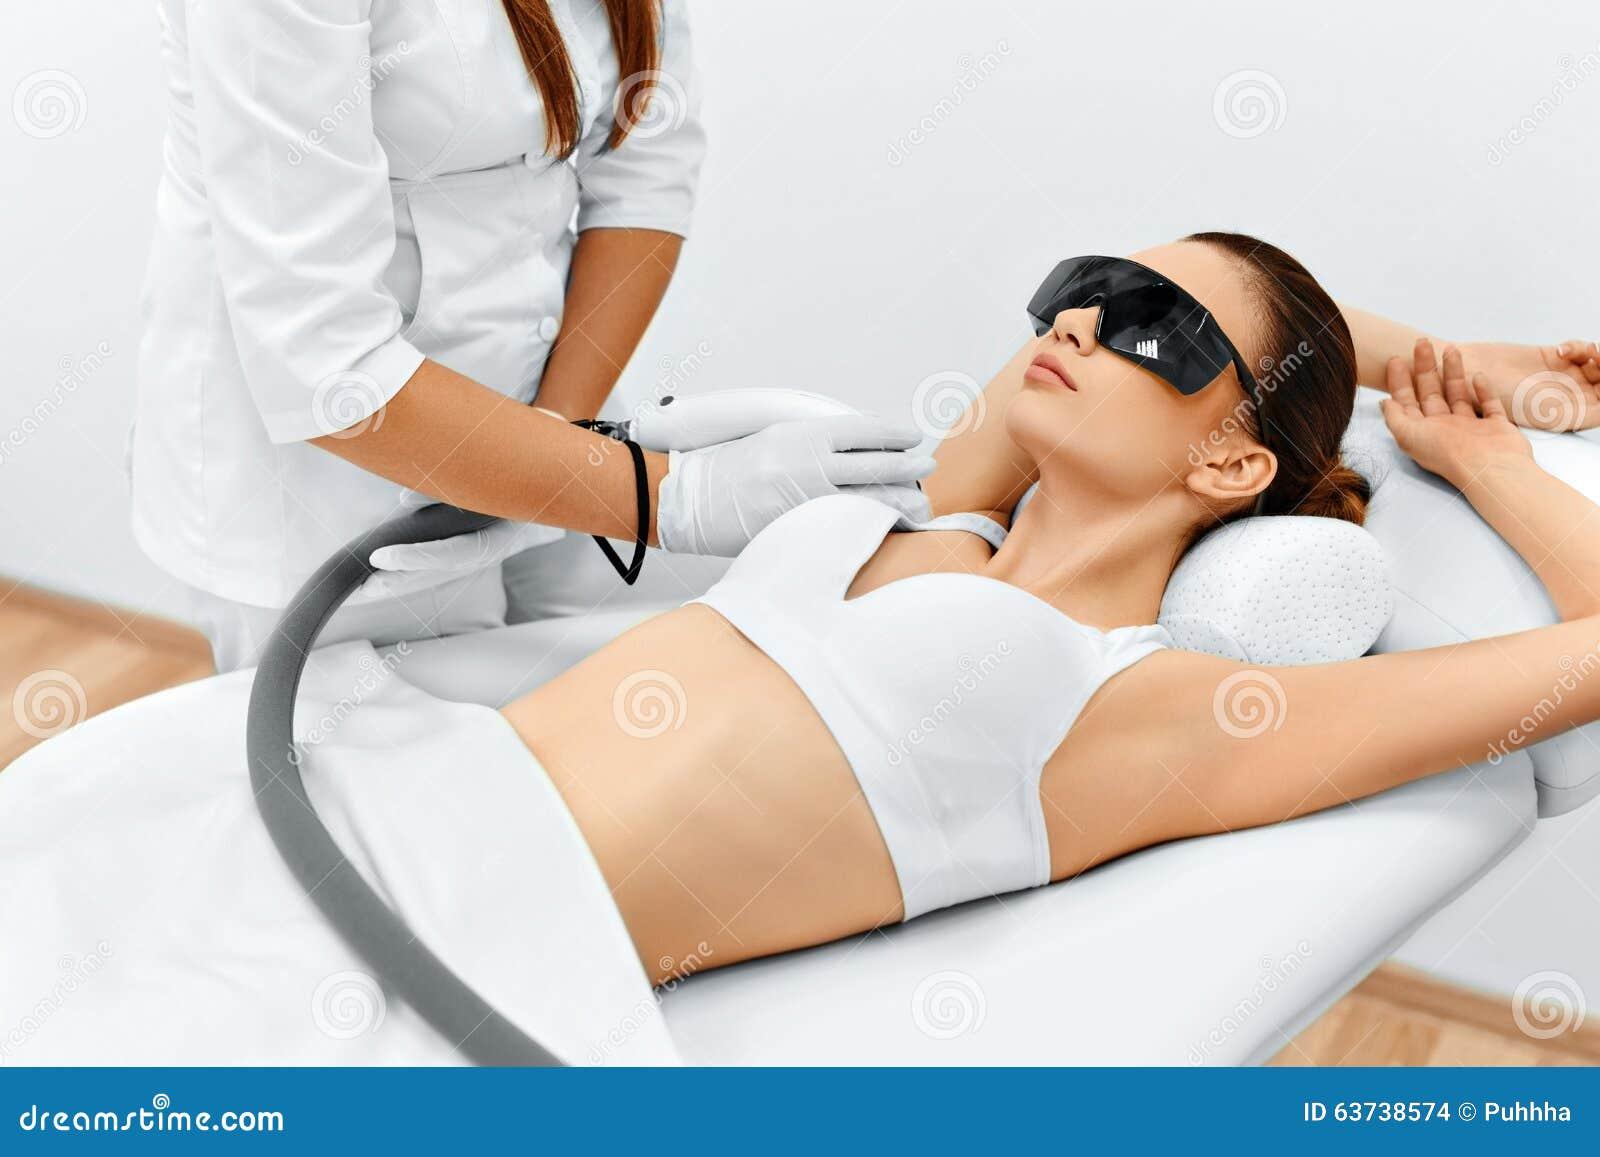 vagina laser cannon